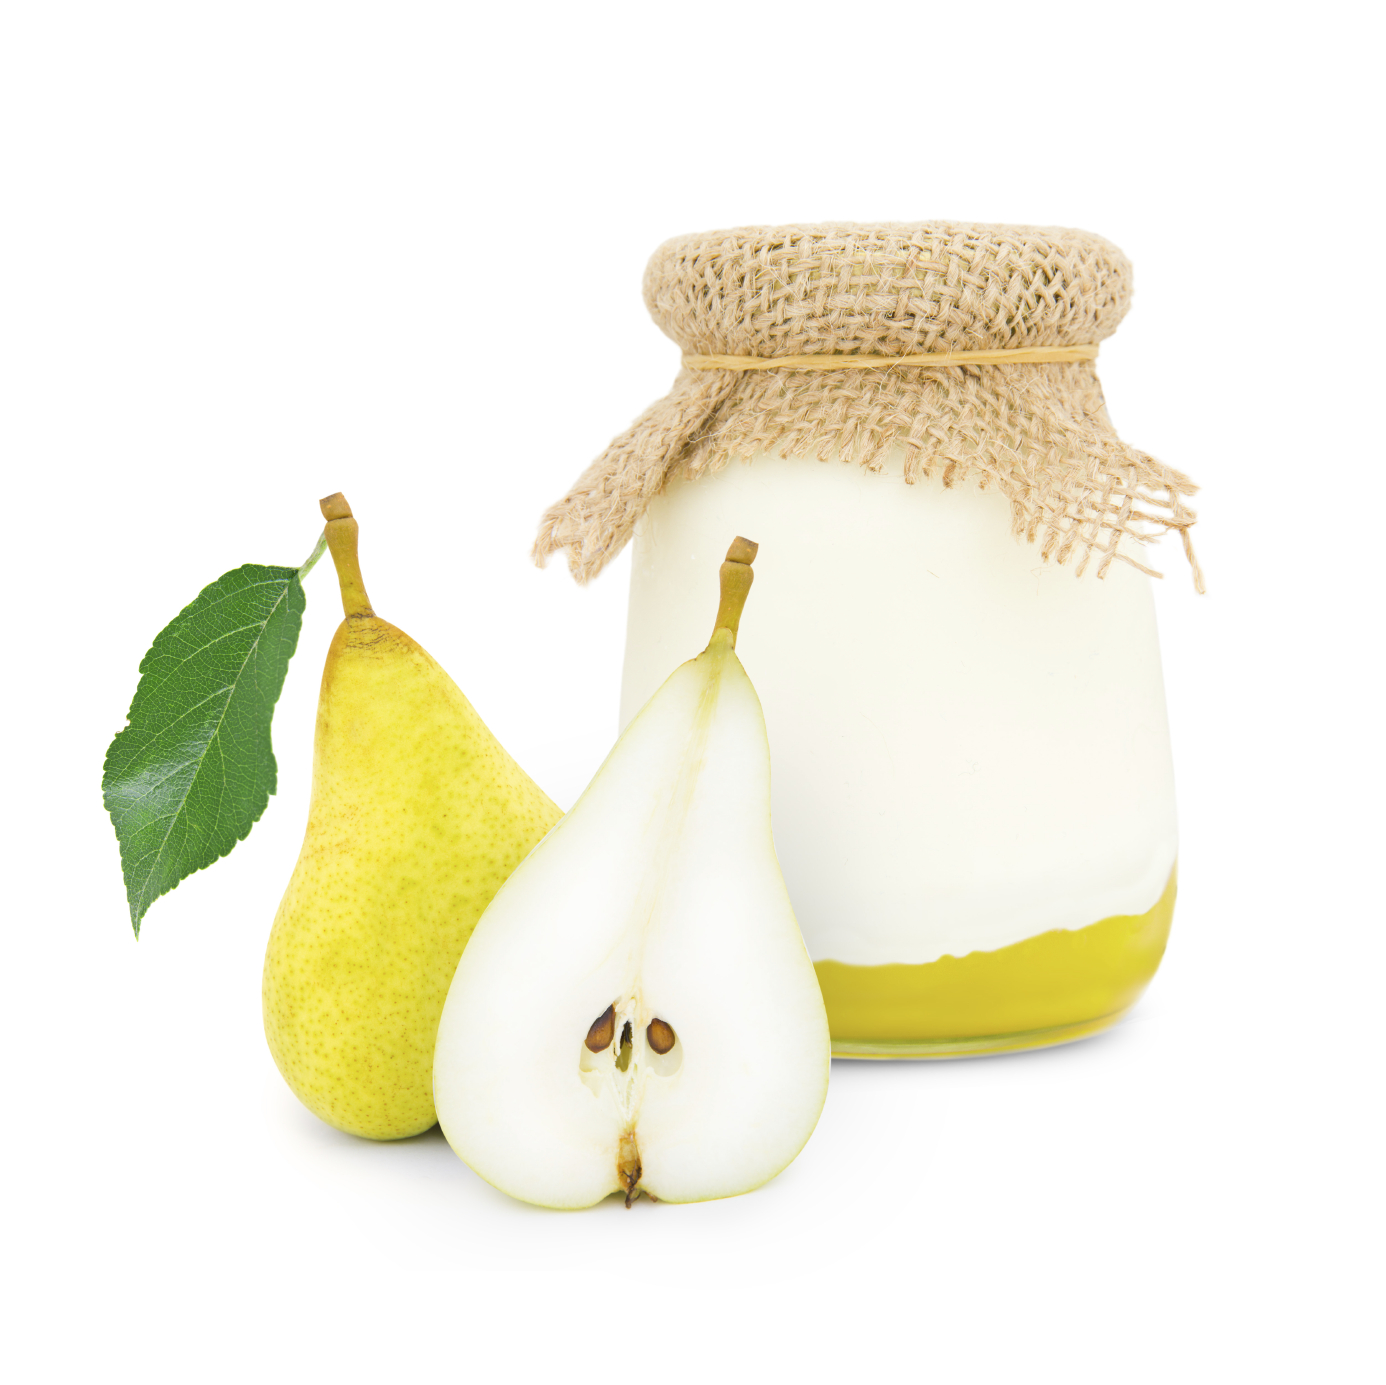 Copa de compota de pera y mousse de yogur con limón